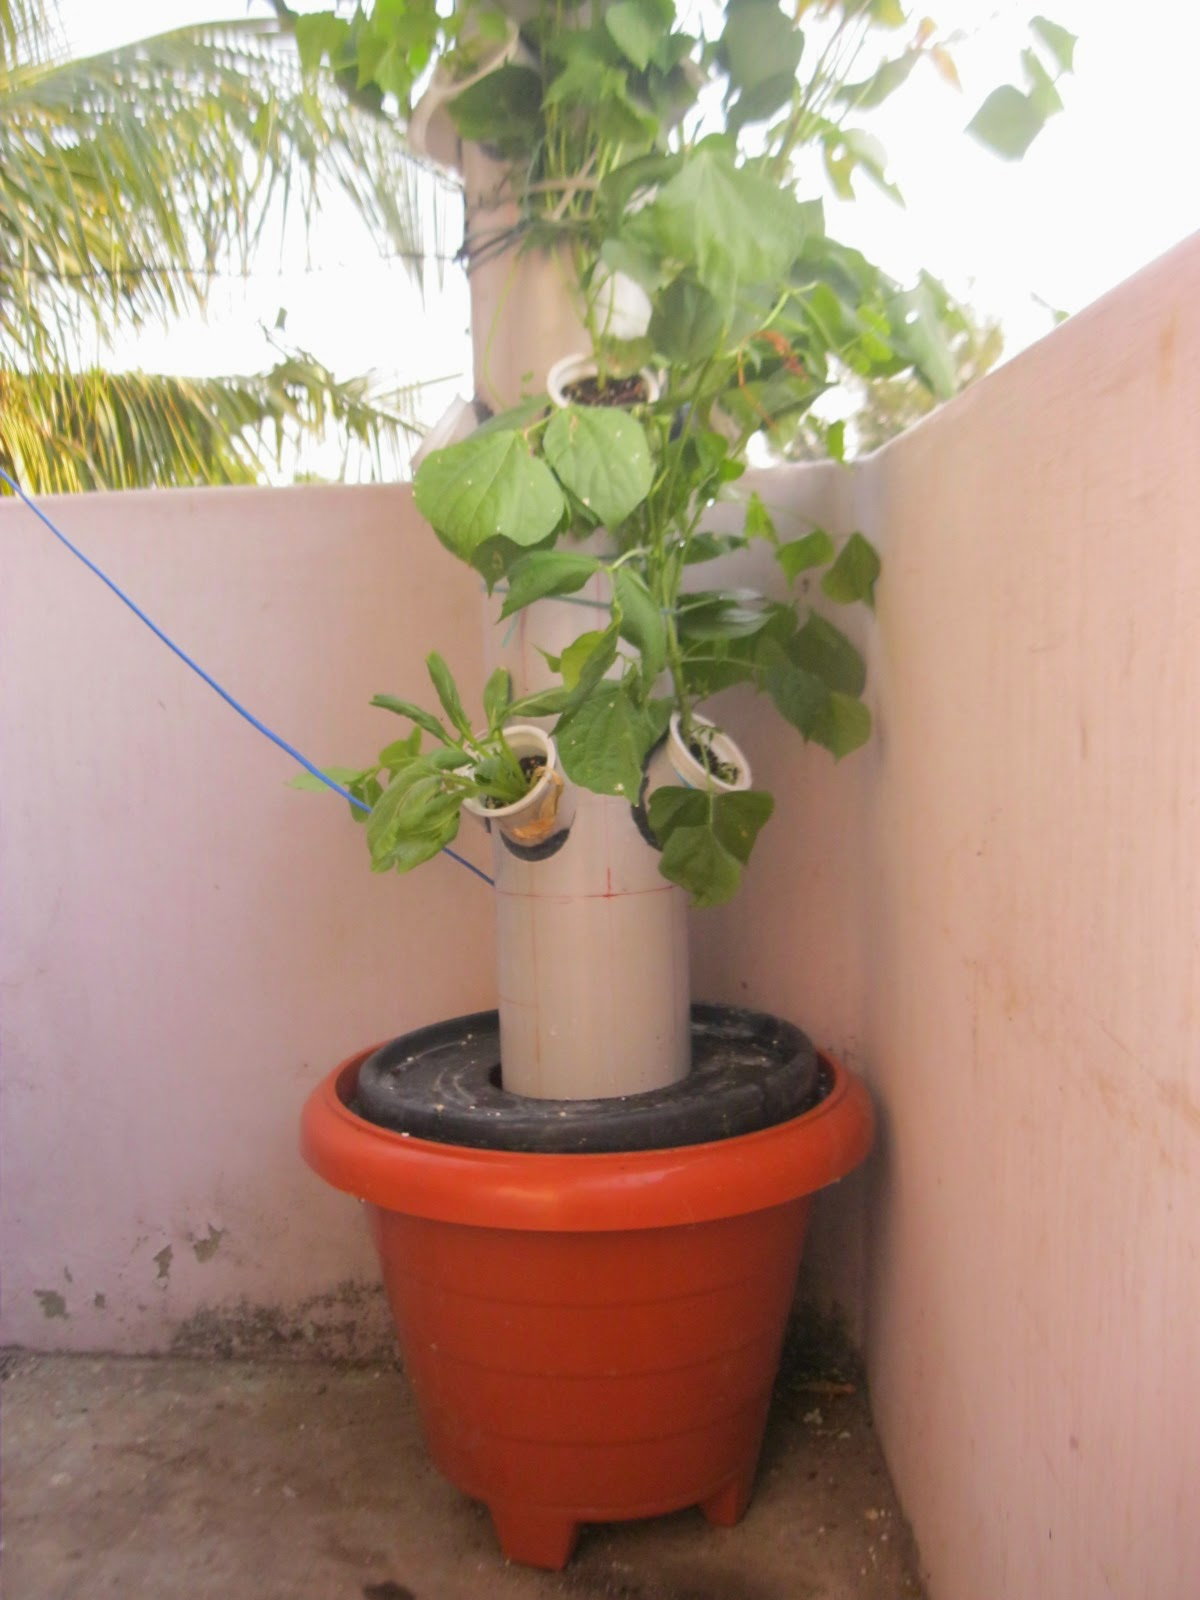 Chennai Hydroponics Aeroponic Tower Garden Growing System